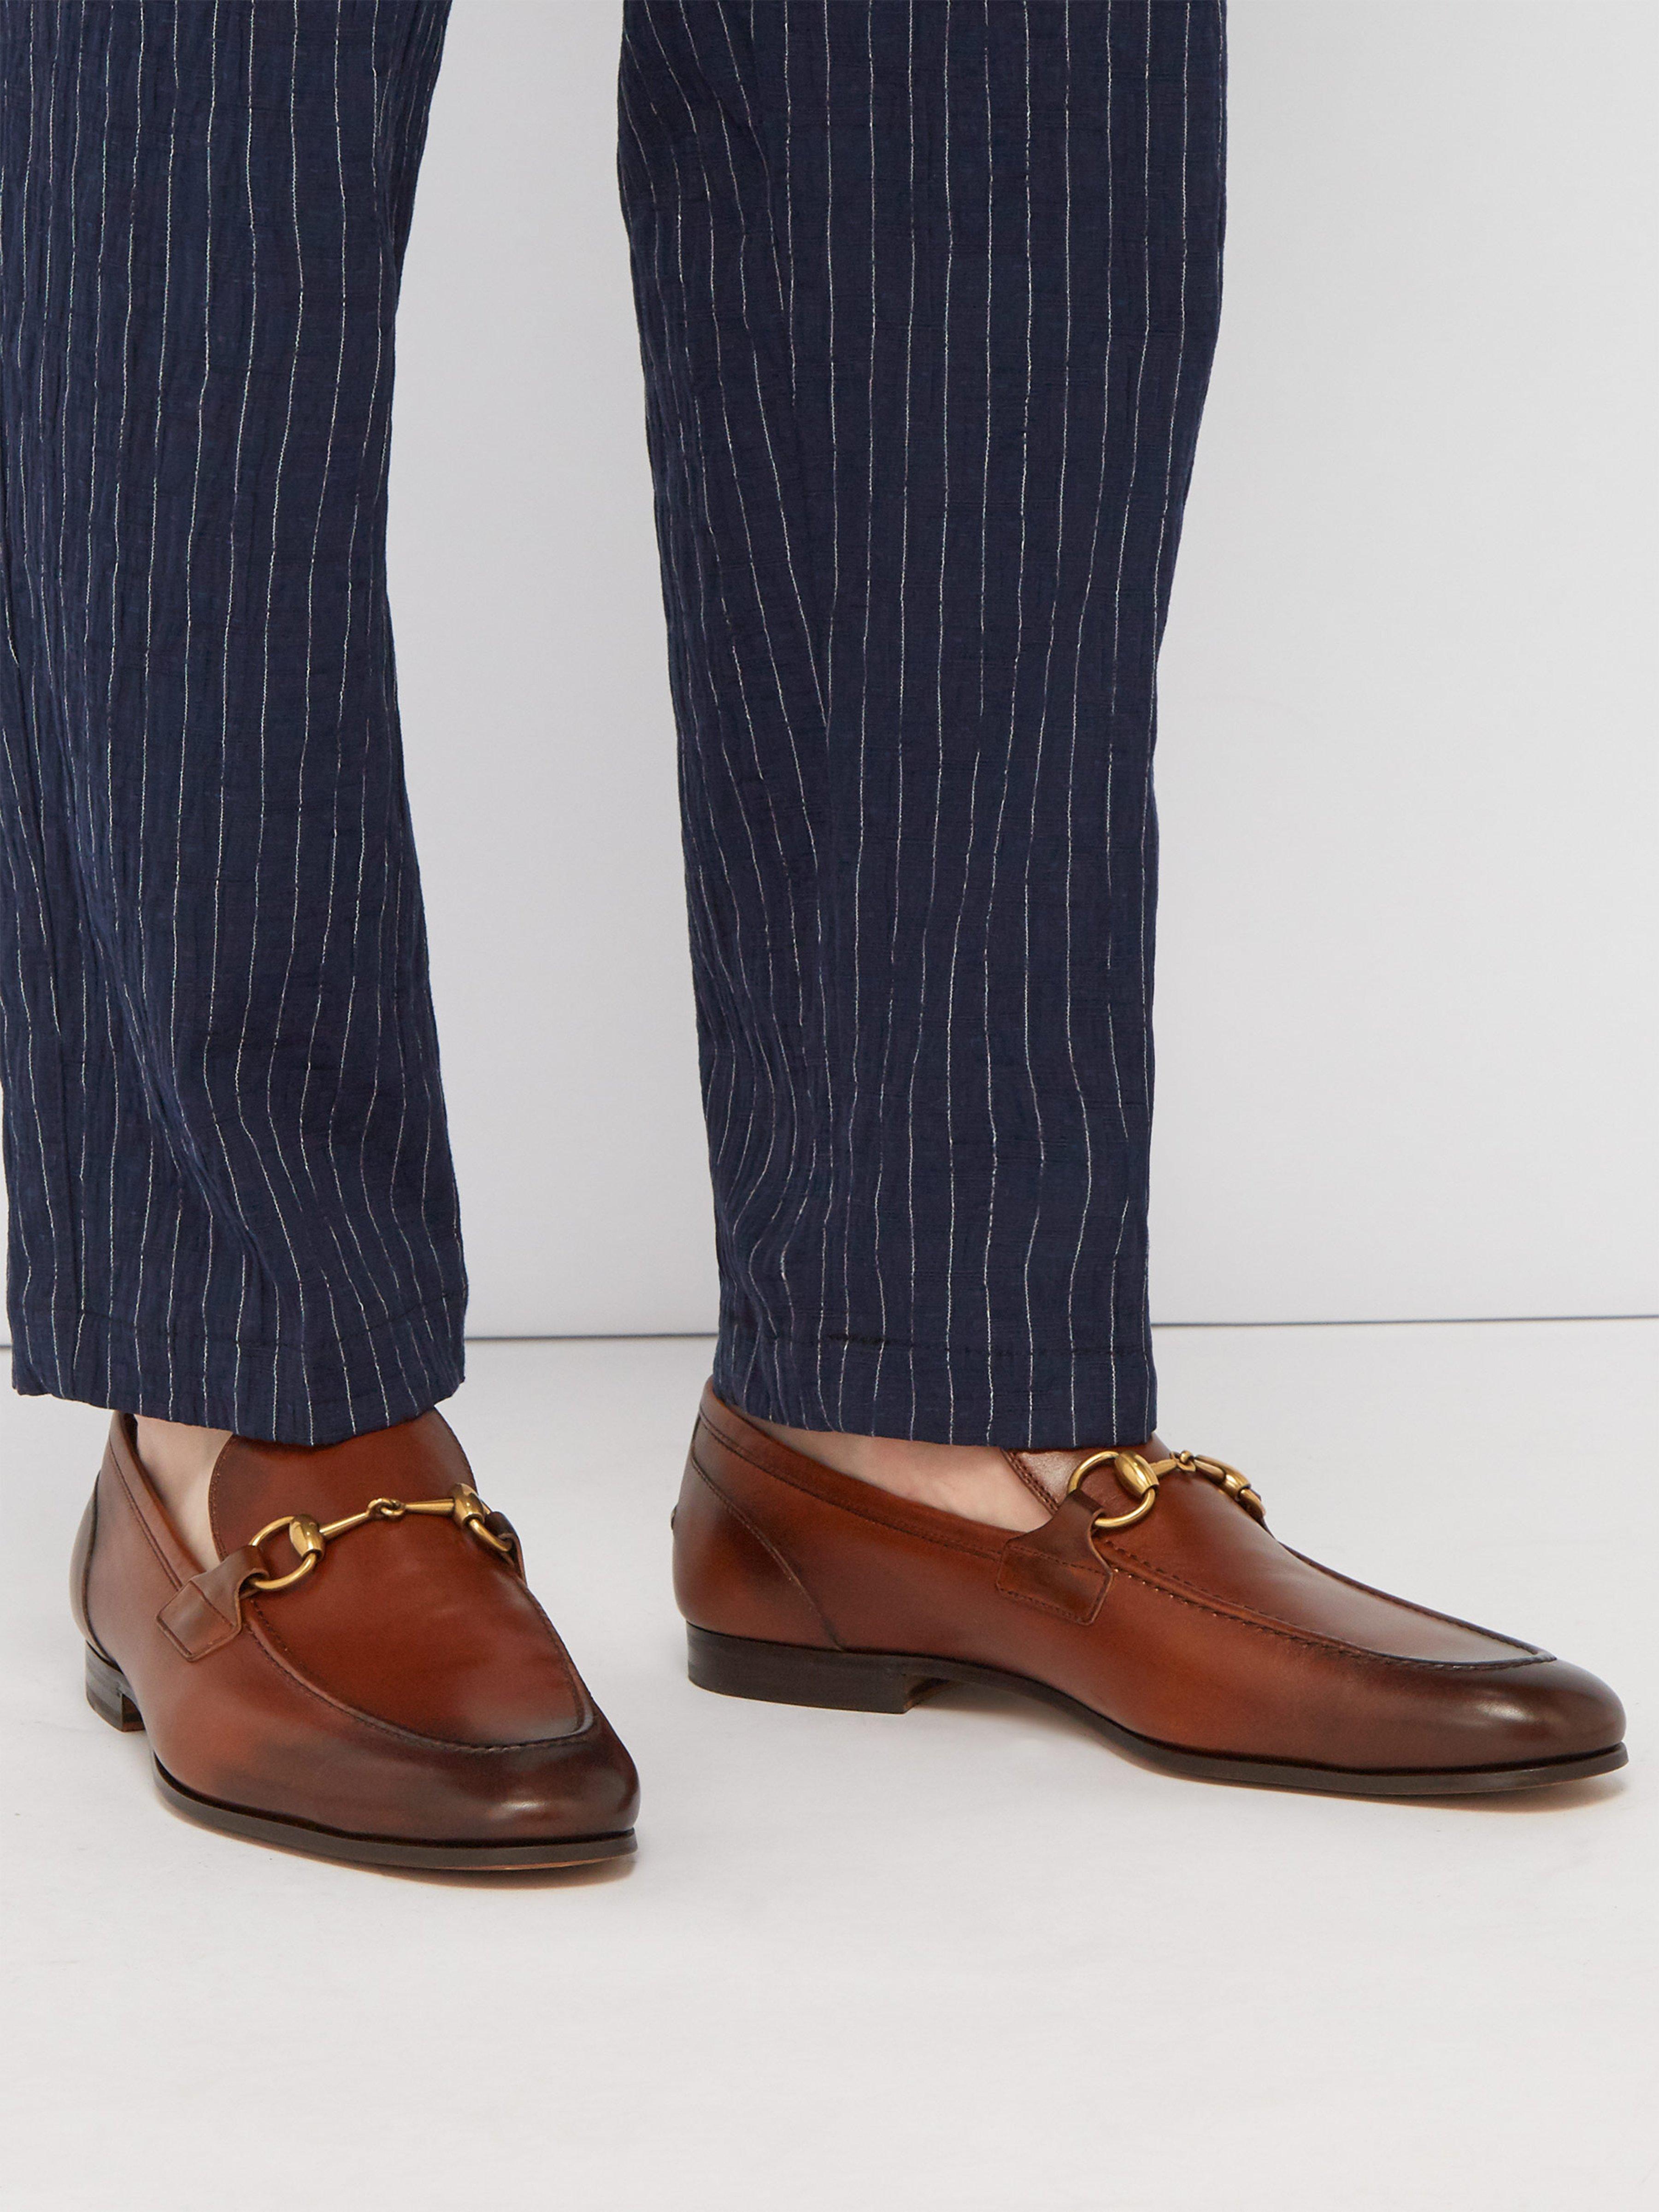 d1751ba8160 Gucci Jordan Horsebit Leather Loafers in Brown for Men - Lyst